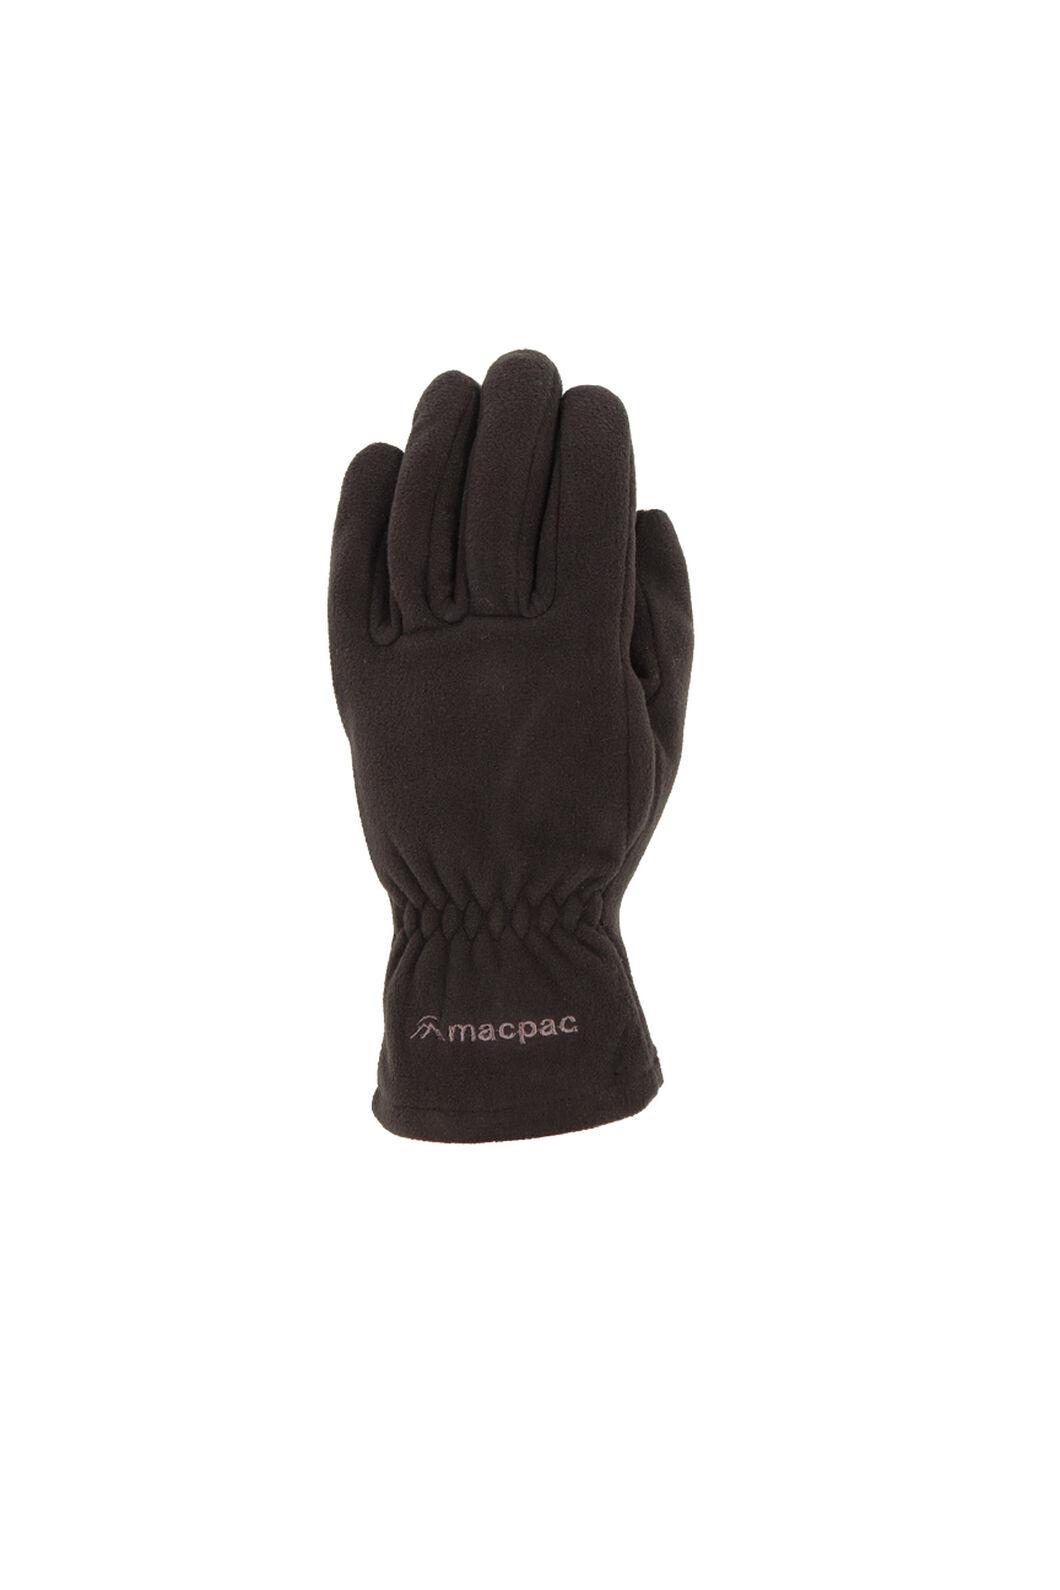 Macpac Tech Fleece Gloves, Black, hi-res